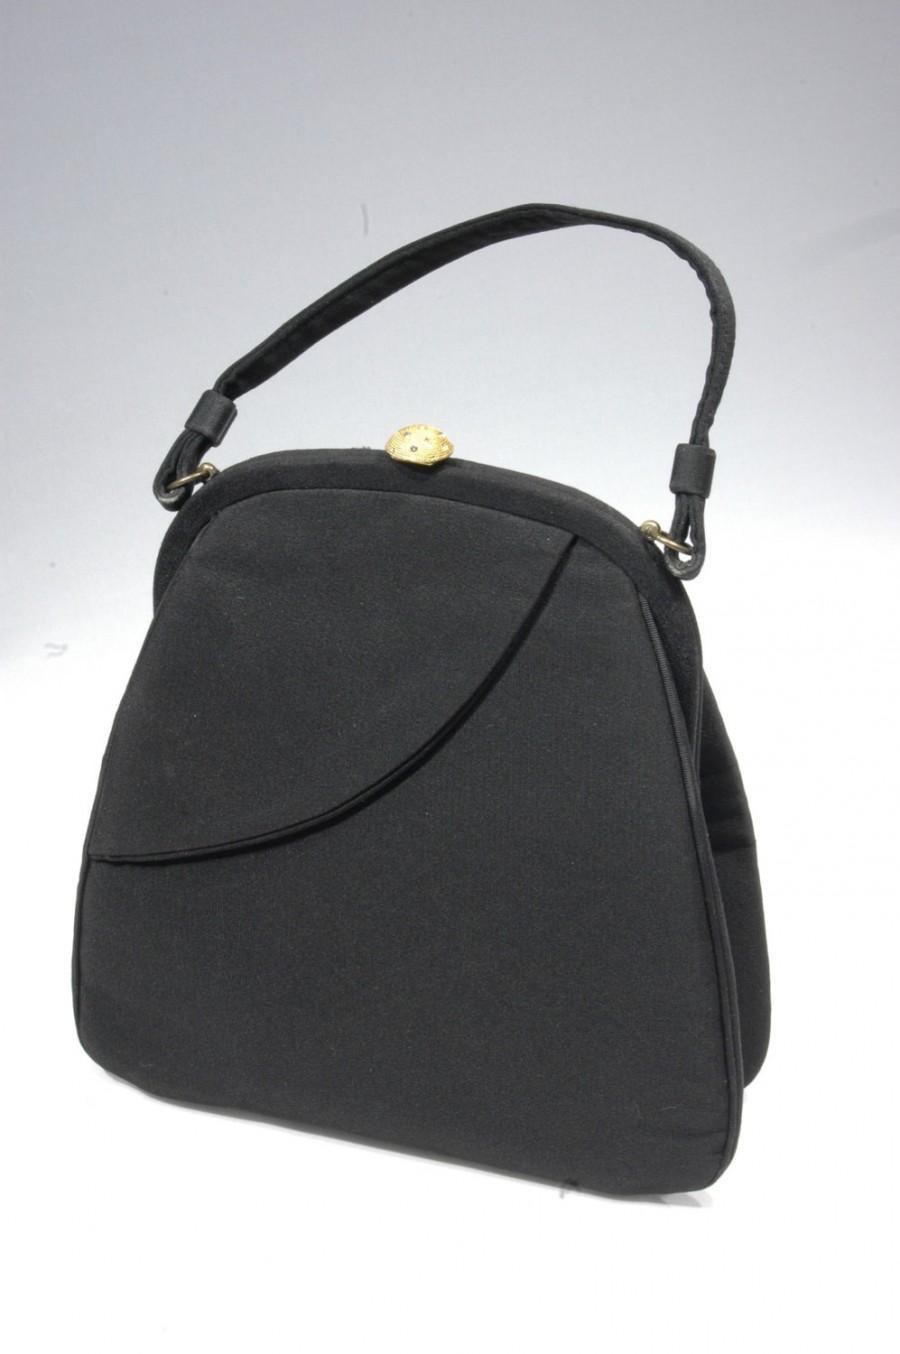 Mariage - Black Evening Handbag Vintage Silk Faille Day to Evening Bag Black Bright Gold Clasp With Rhinestones 1950s-1960 Estate Collectors VintIcon